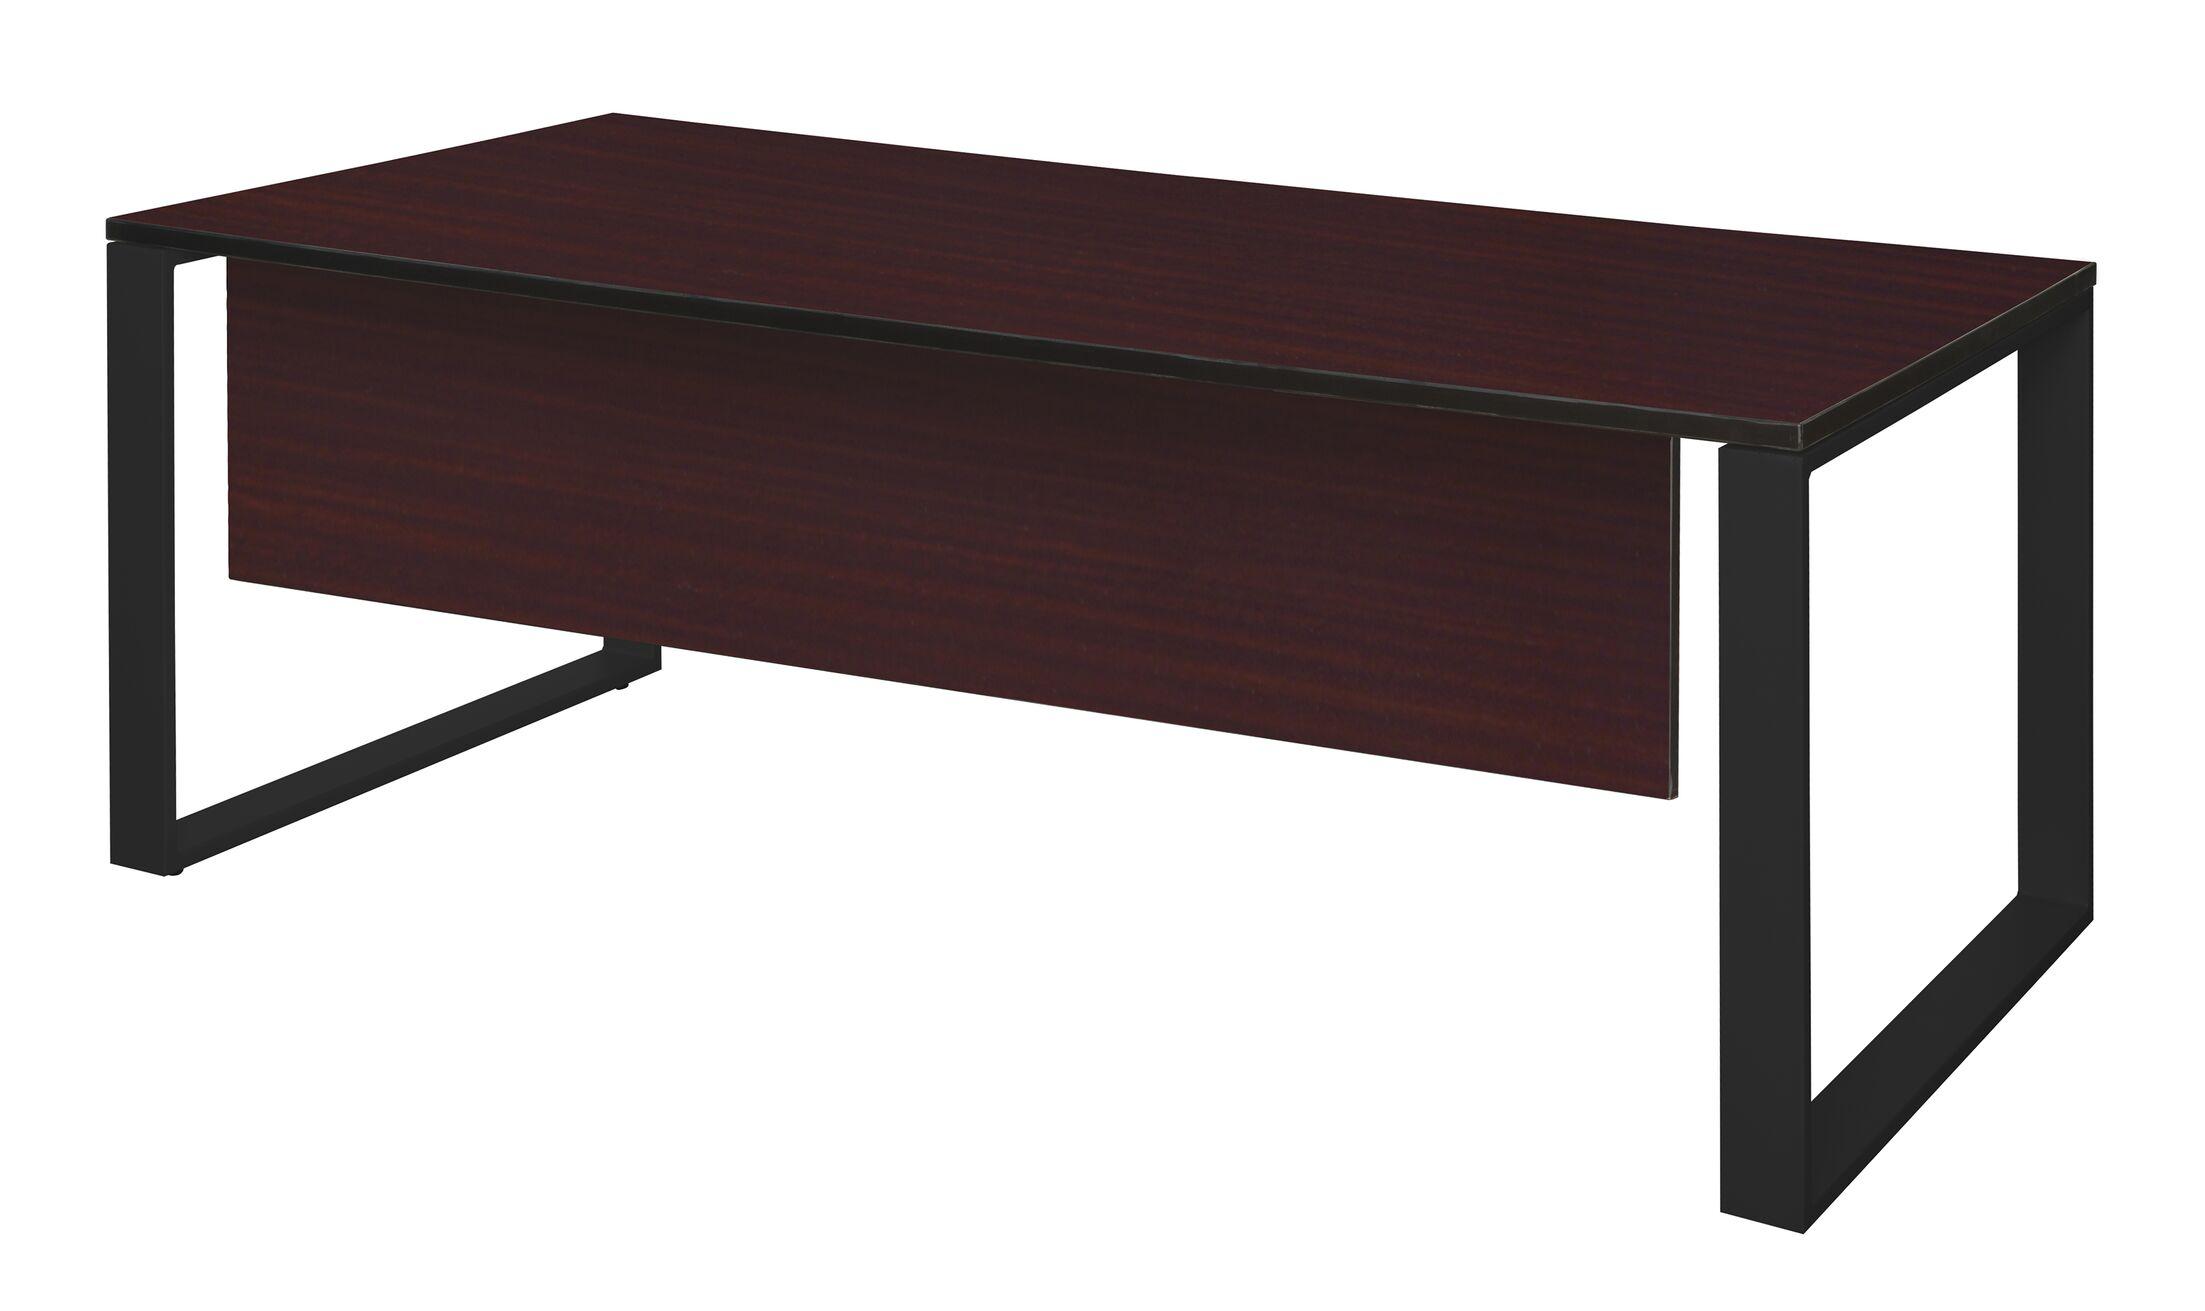 Mireya Training Table with Modesty Panel Tabletop Finish: Mahogany, Size: 30